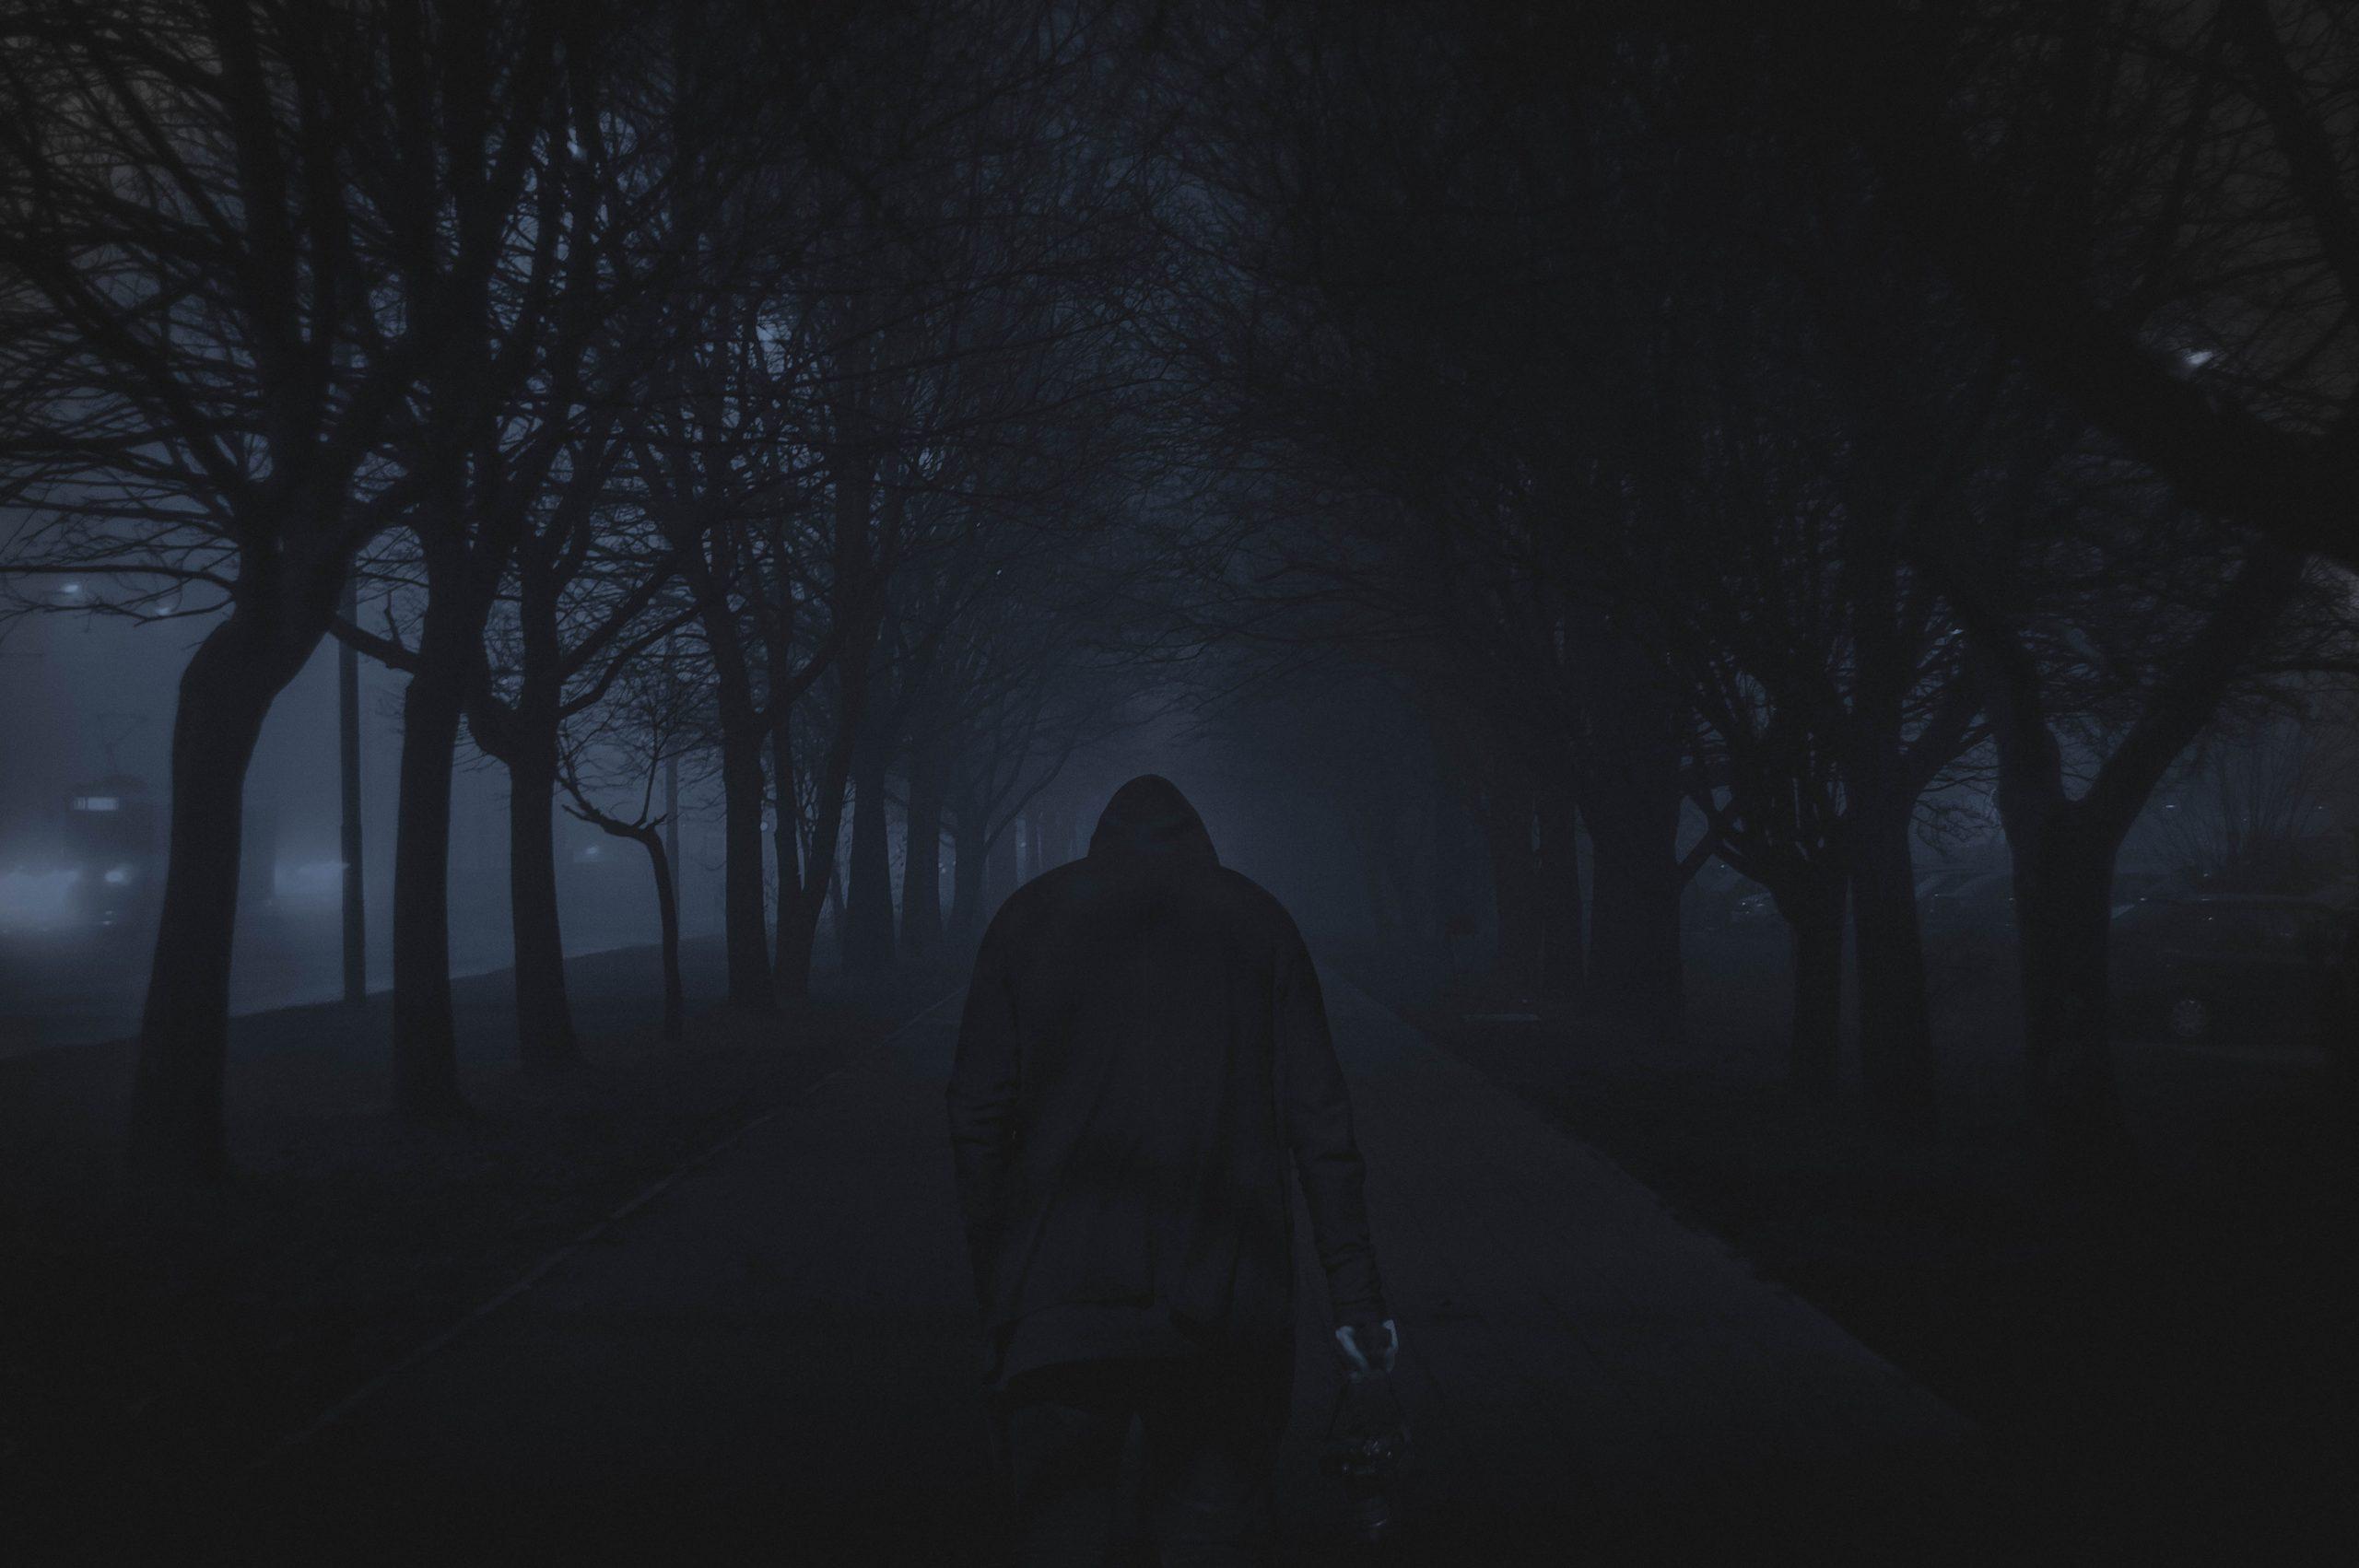 wallpaper Person walking between trees